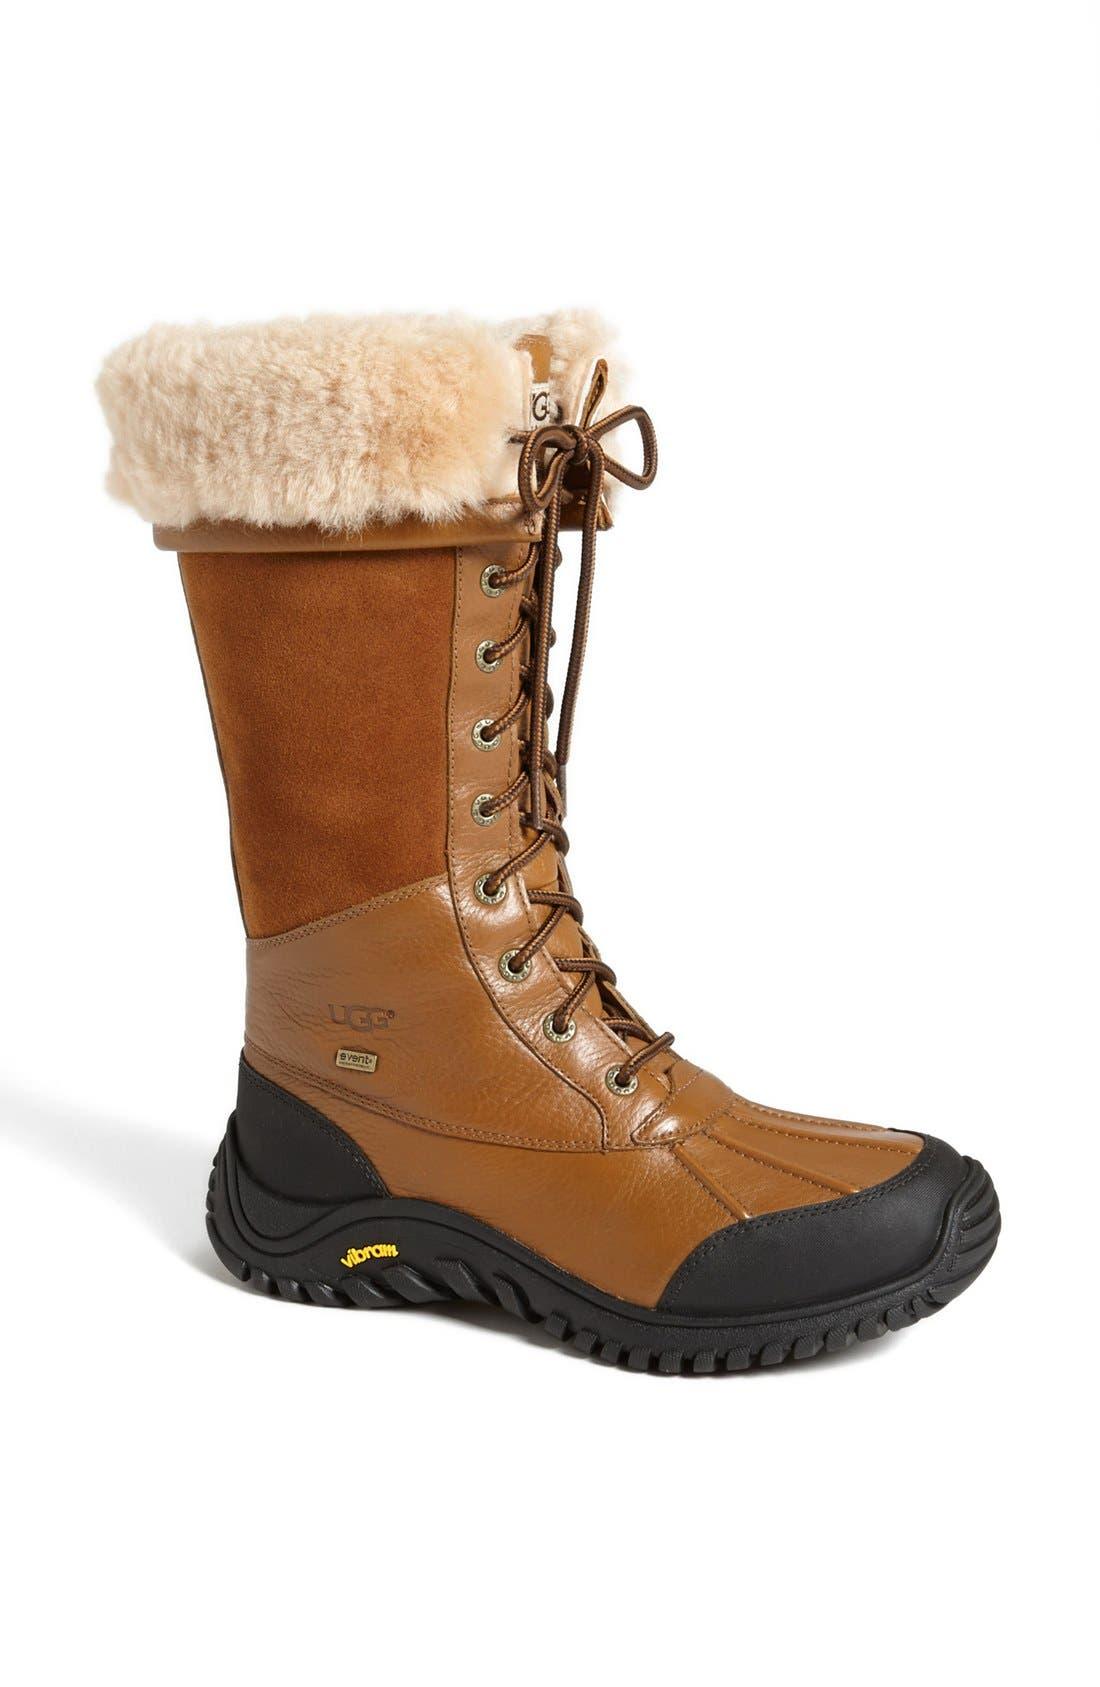 Alternate Image 1 Selected - UGG® Adirondack Tall Boot (Women)